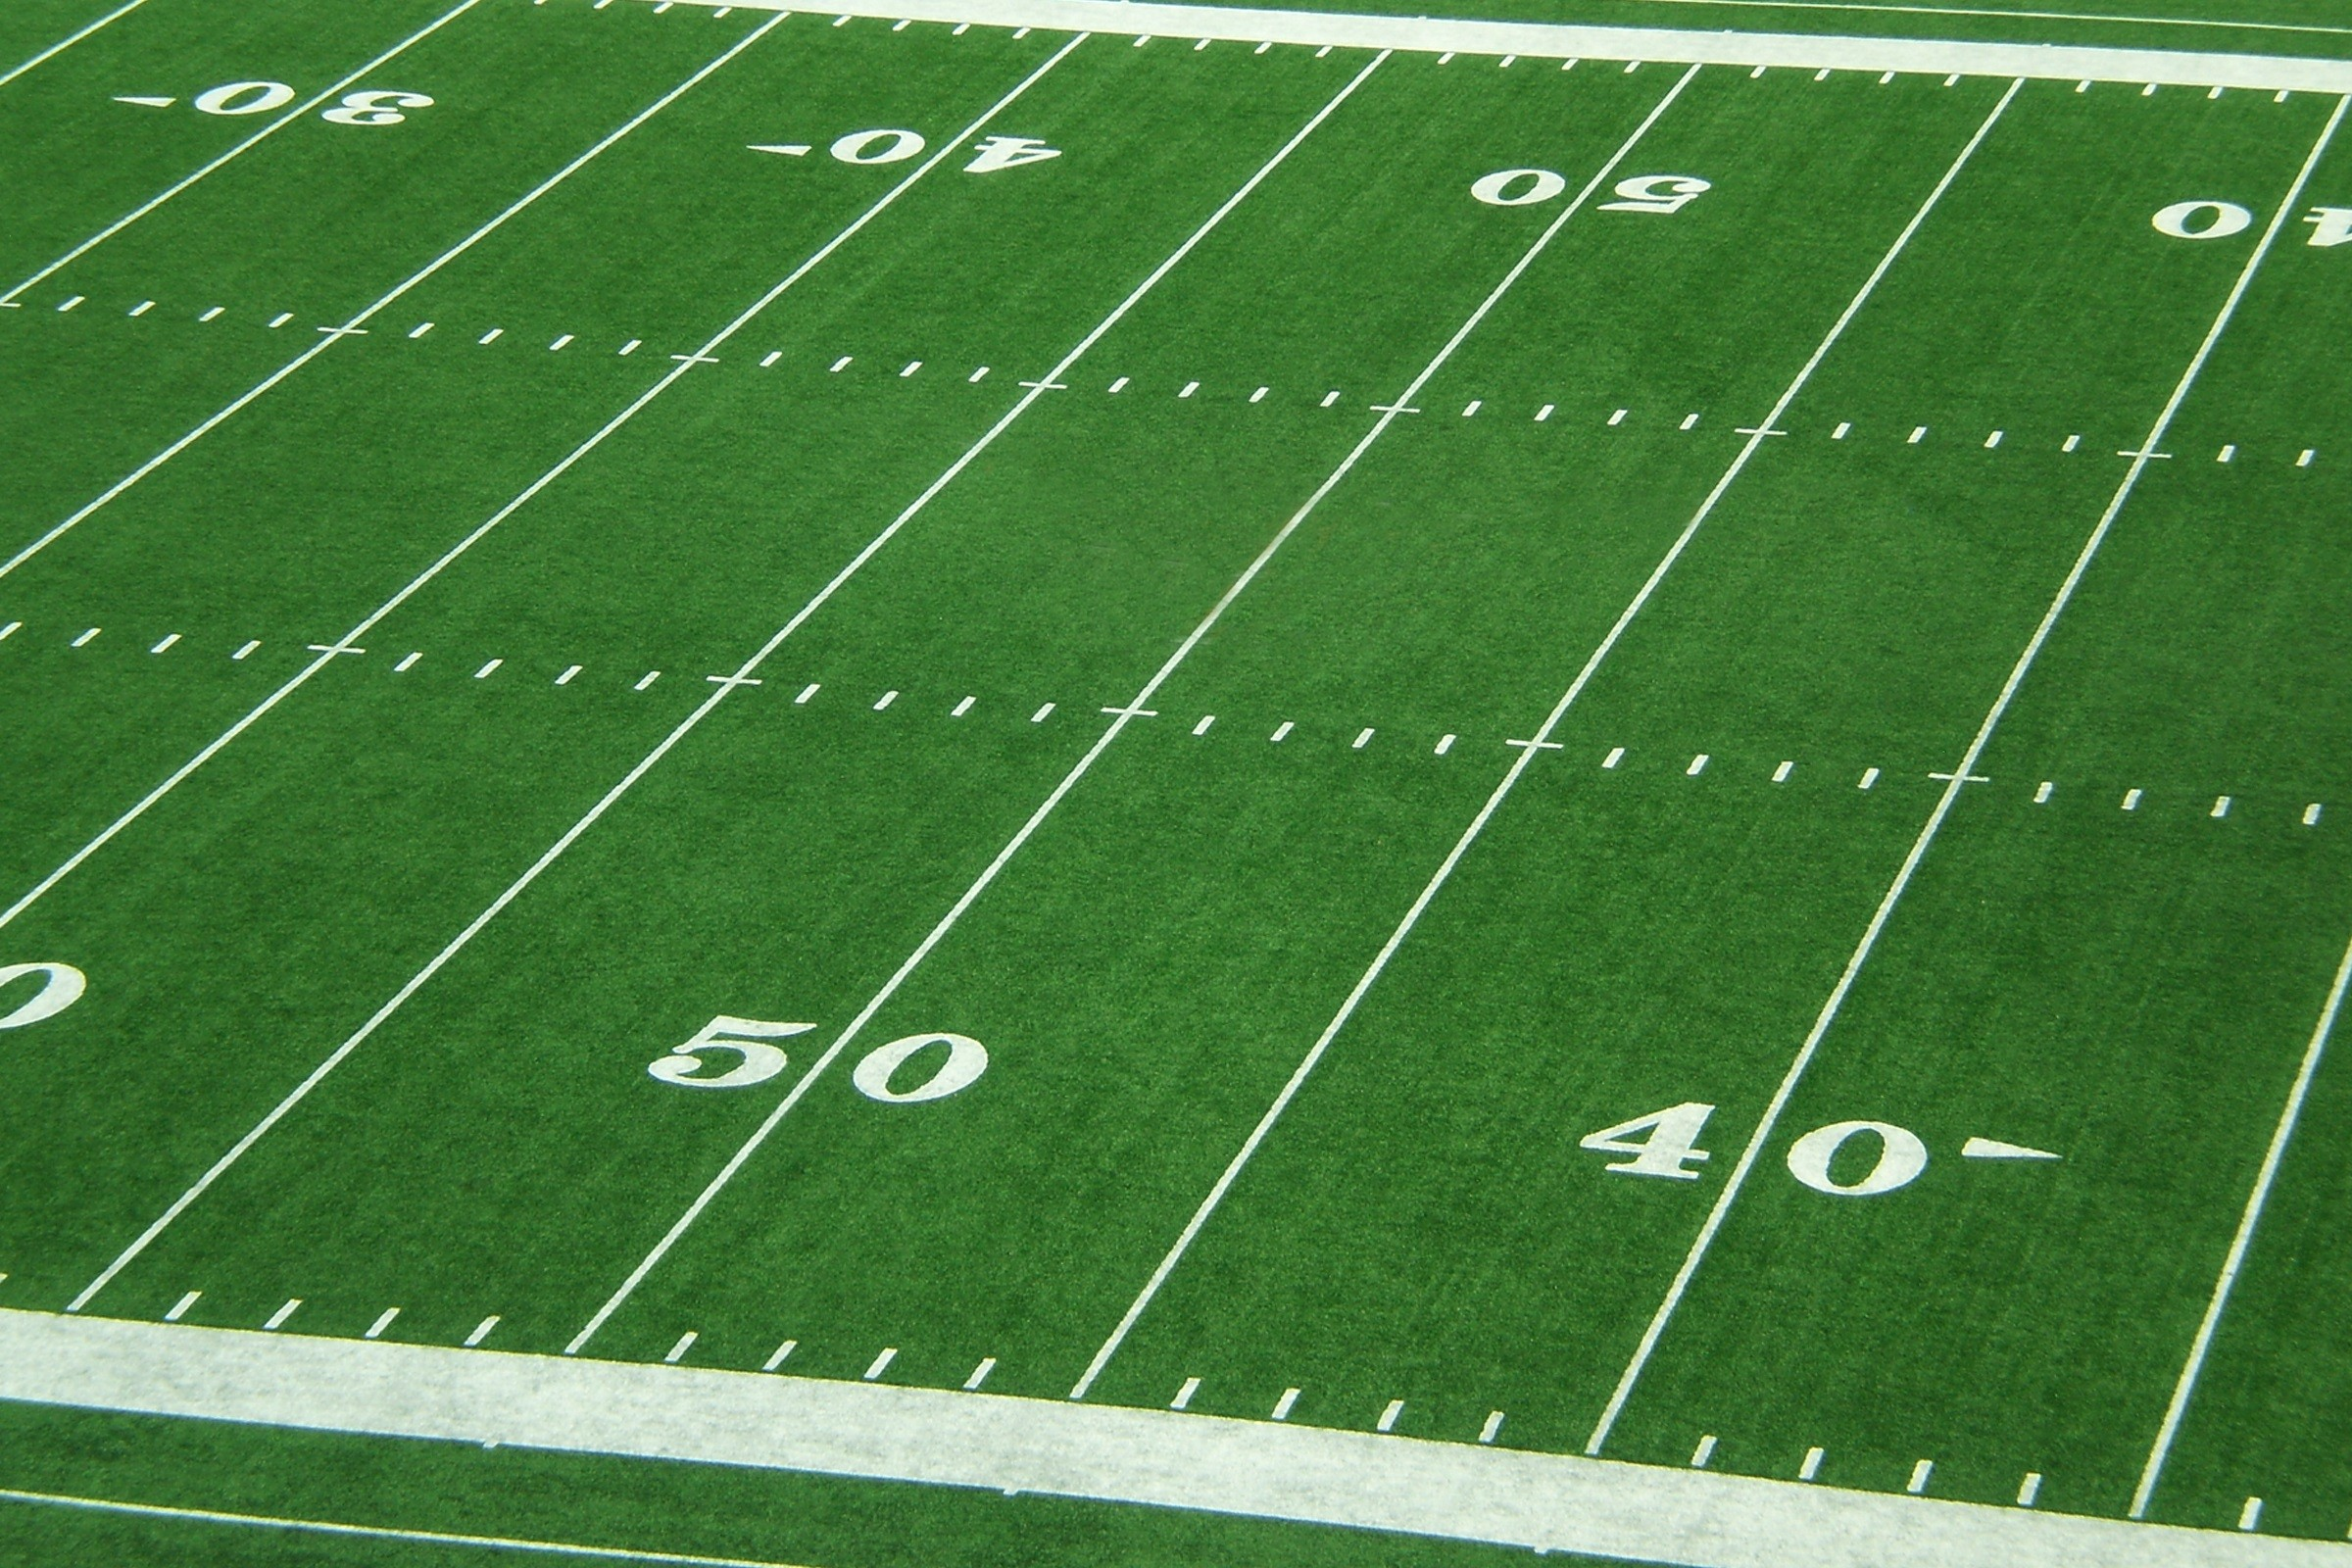 Soccer Iphone Wallpaper Hd Football Field Background 183 ① Download Free Full Hd